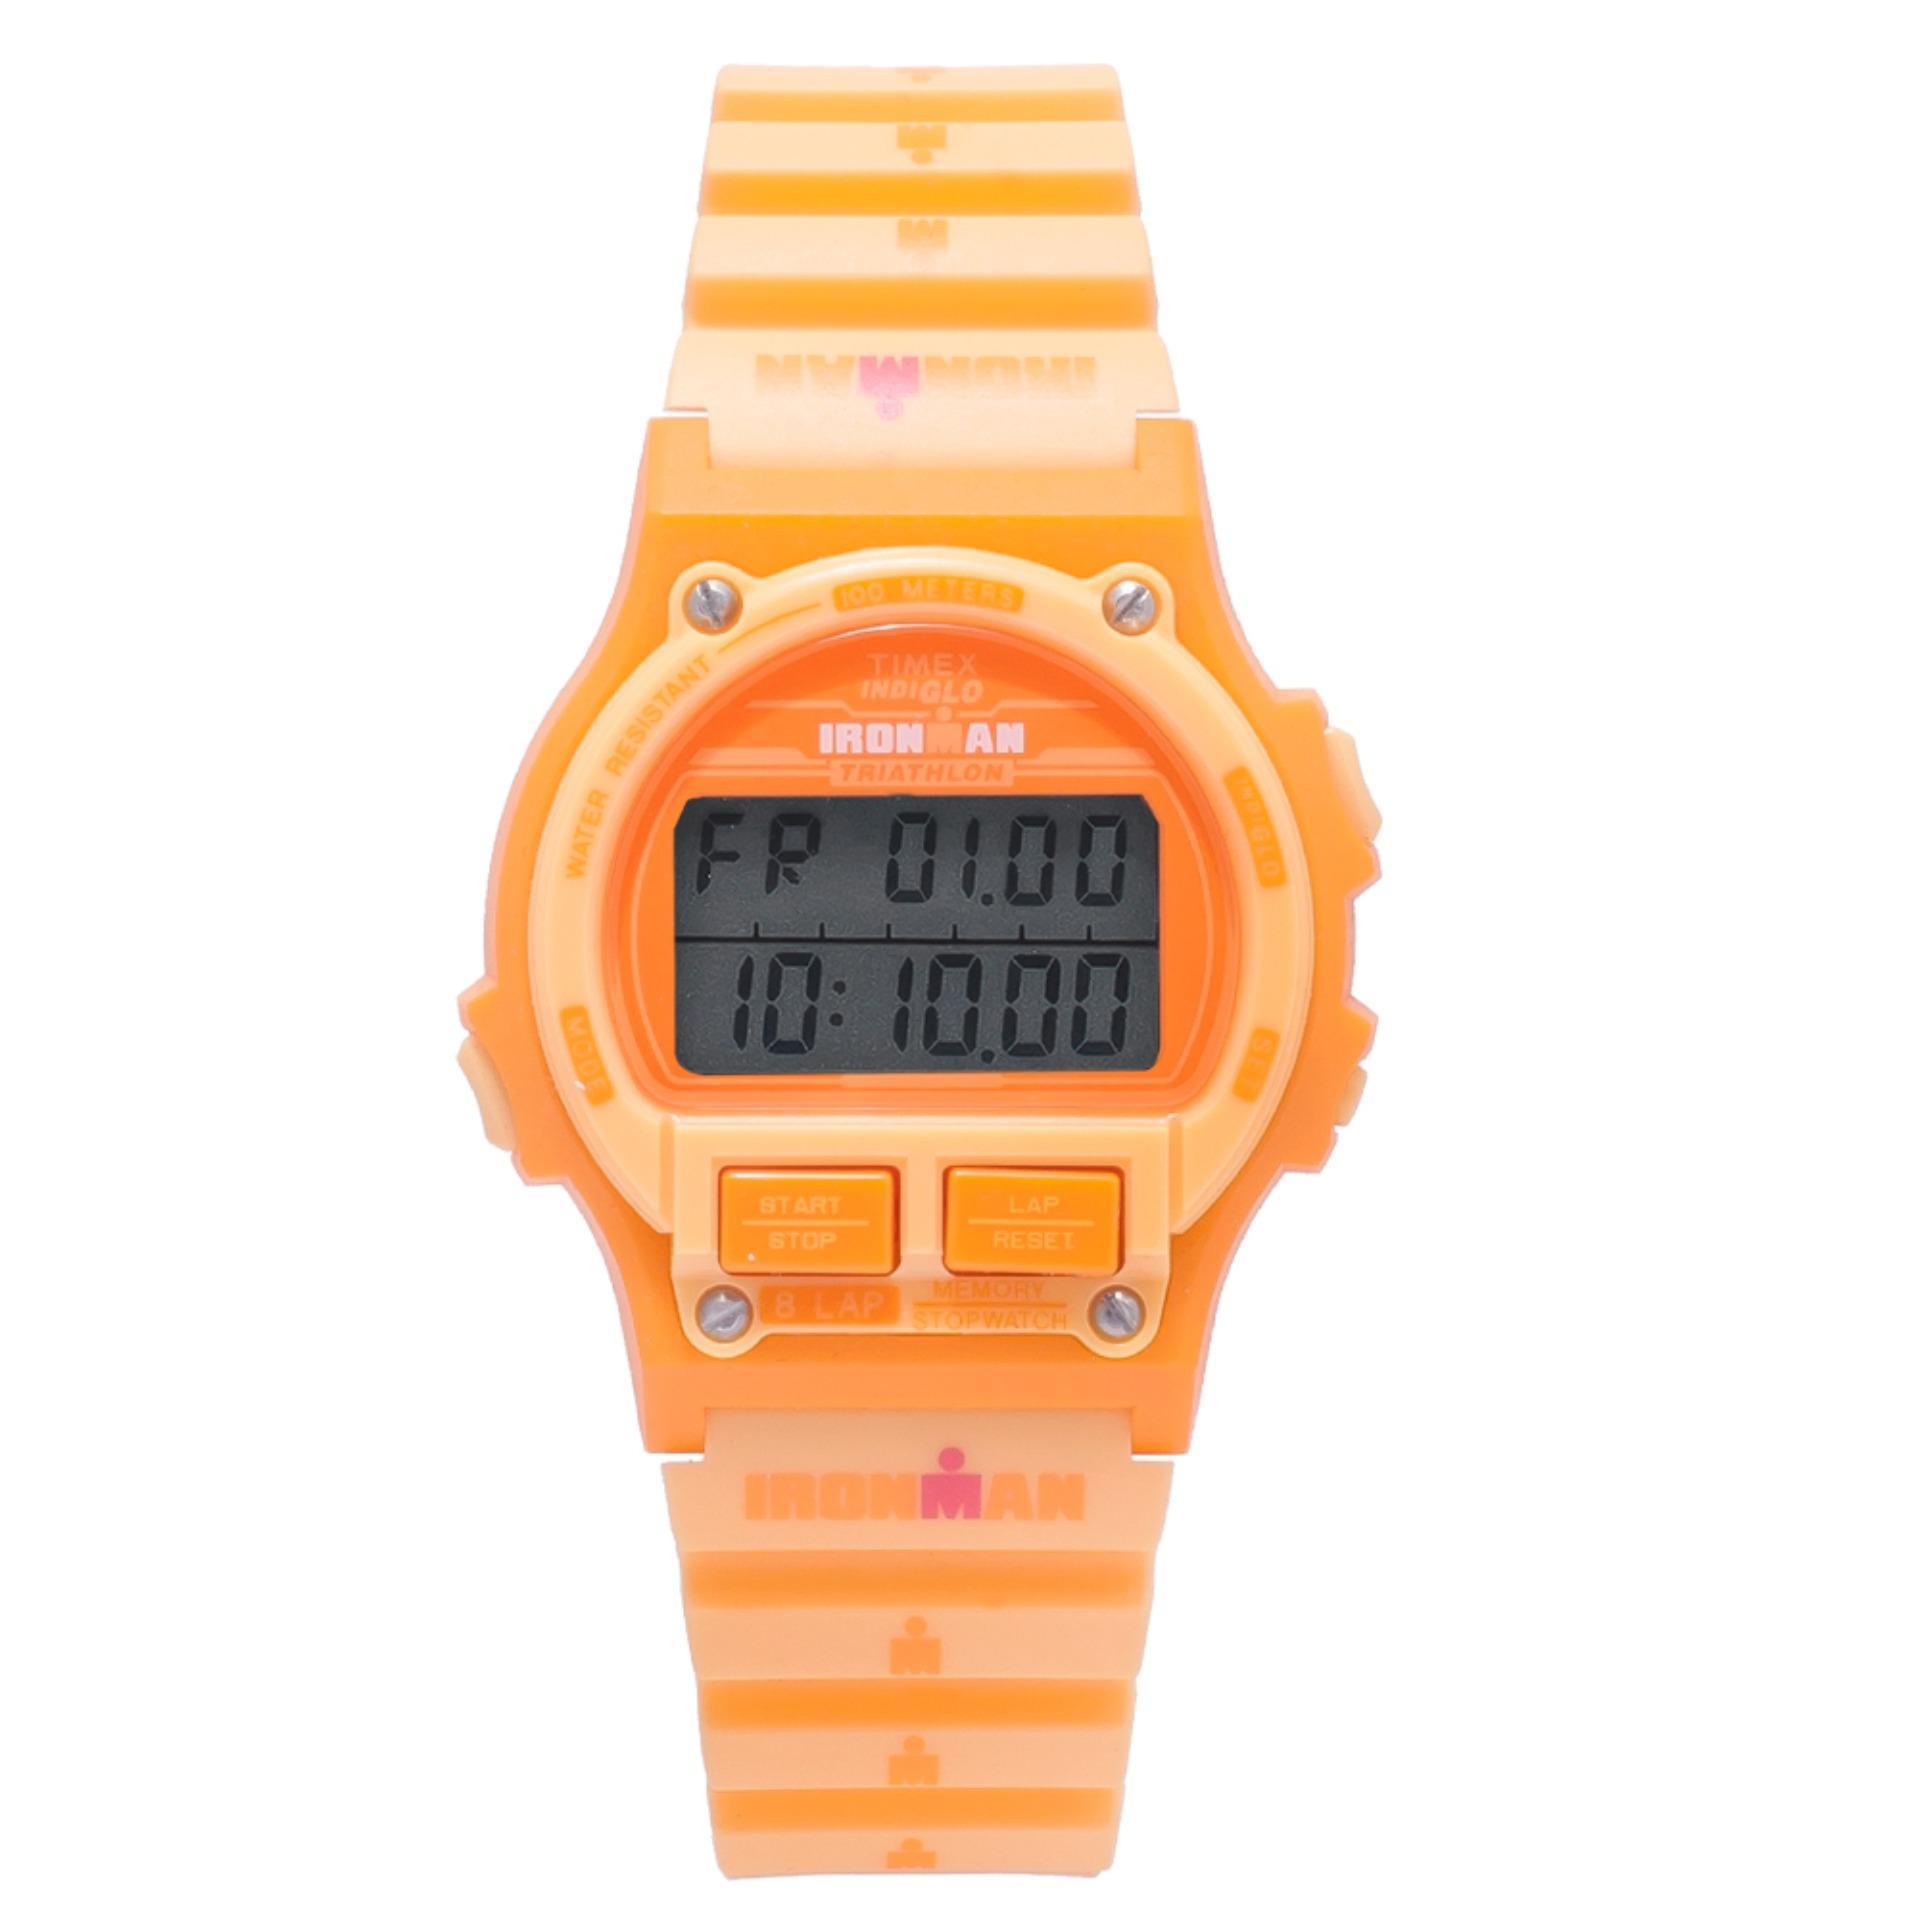 98e83e45d5cc Timex Ironman 8 Lap Orange Digital Rubber Watch TW5M04500 SPORTS